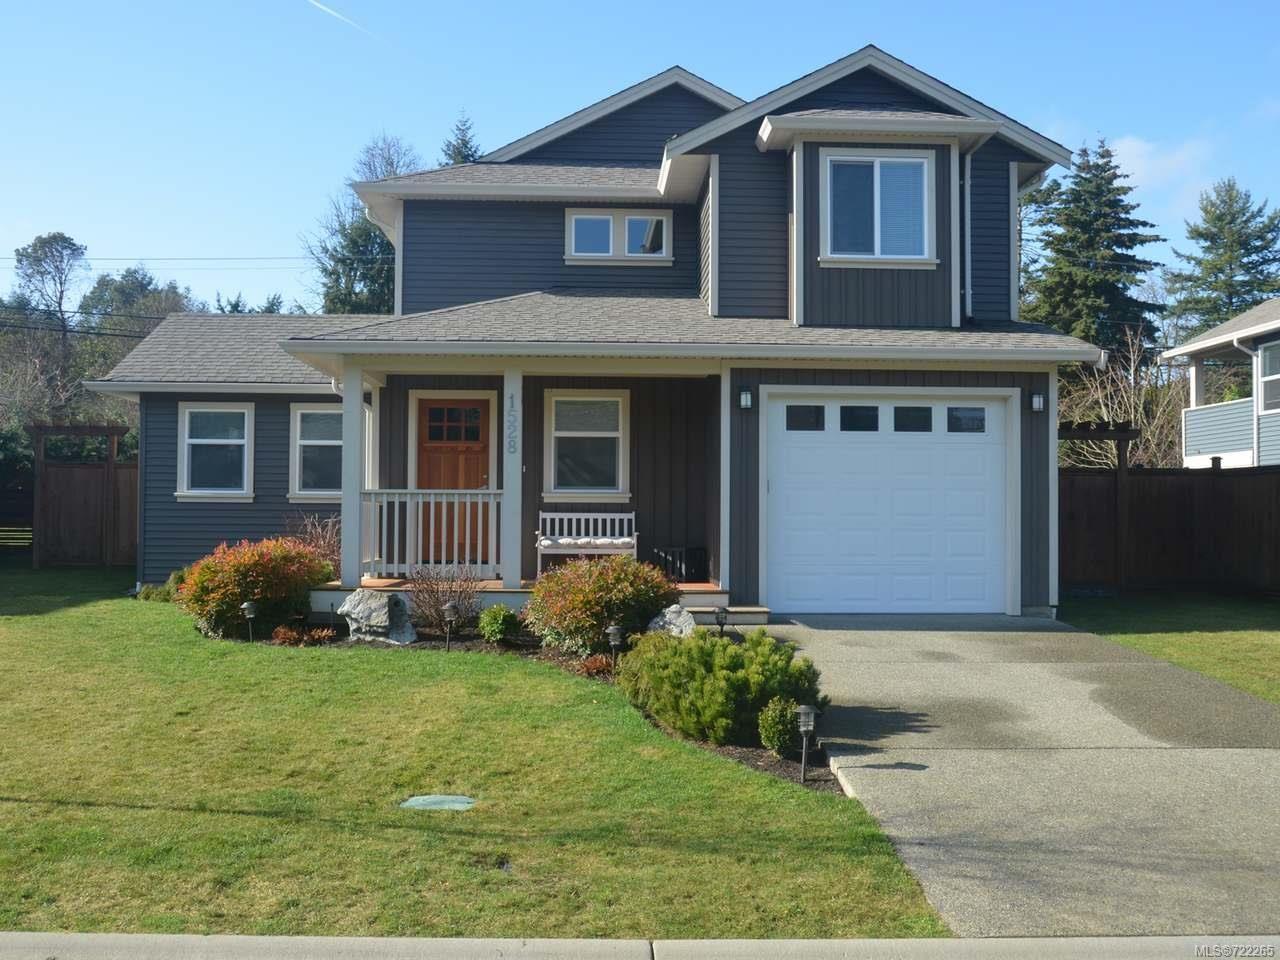 Main Photo: 1528 Regatta Pl in COWICHAN BAY: Du Cowichan Bay House for sale (Duncan)  : MLS®# 722265